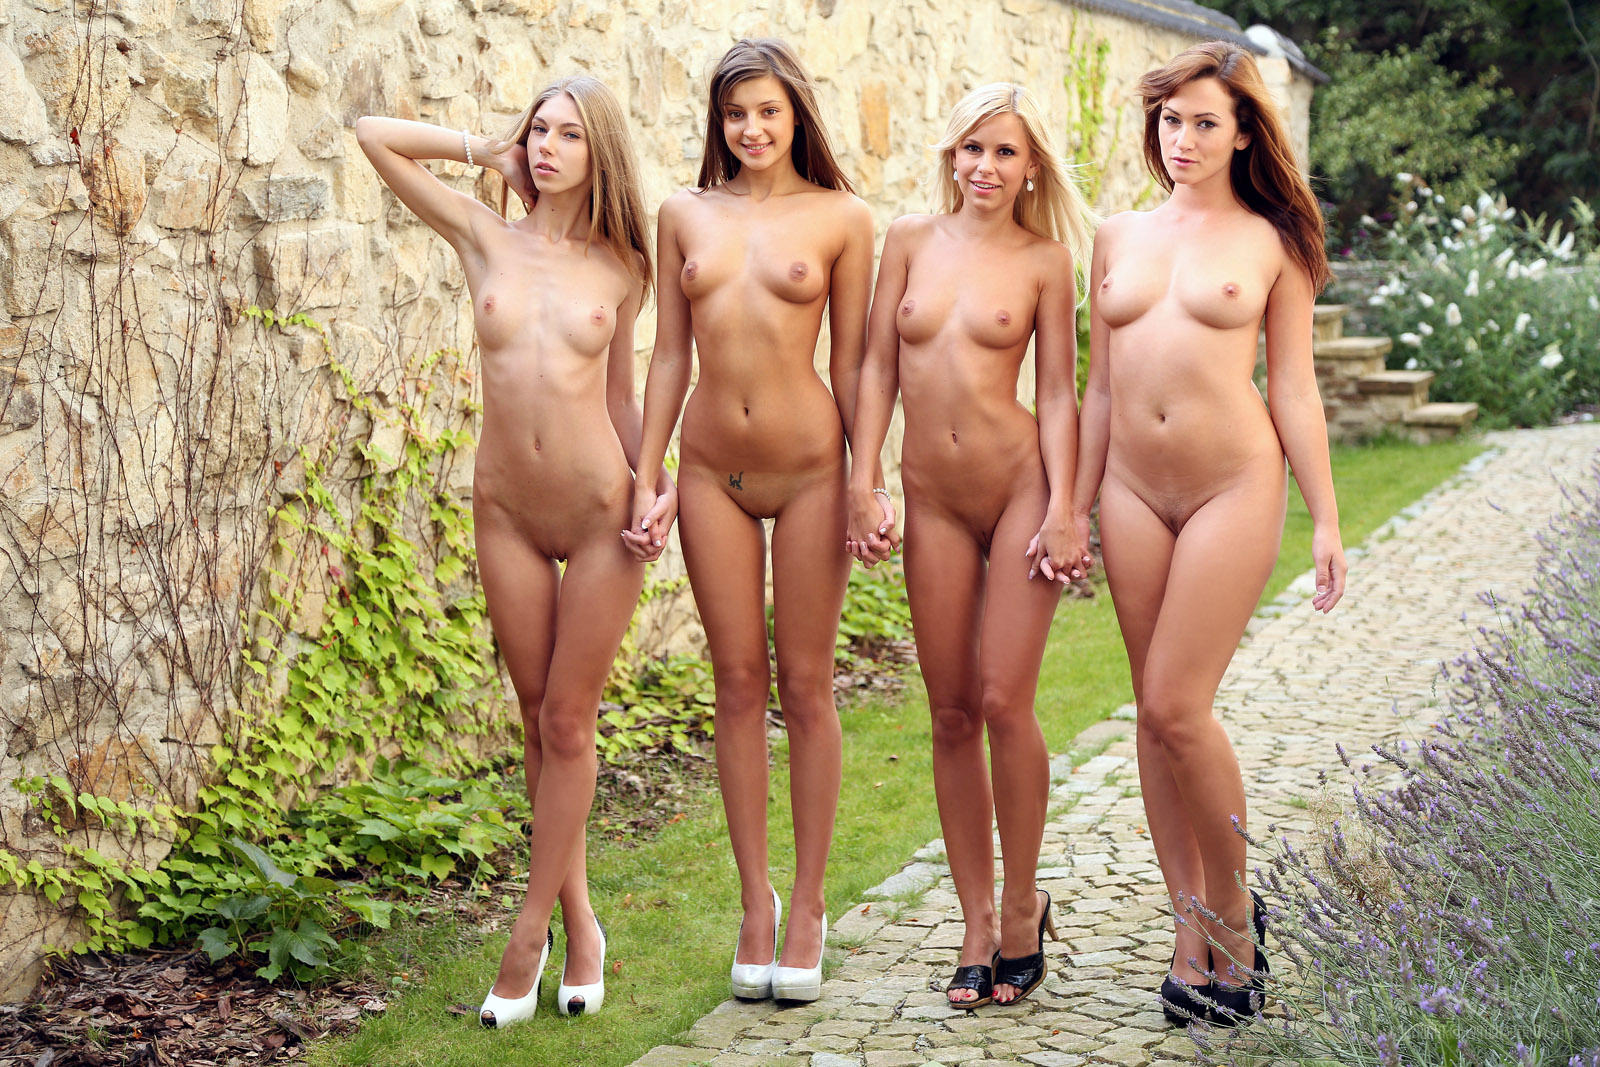 Nude girls in erotic pictures